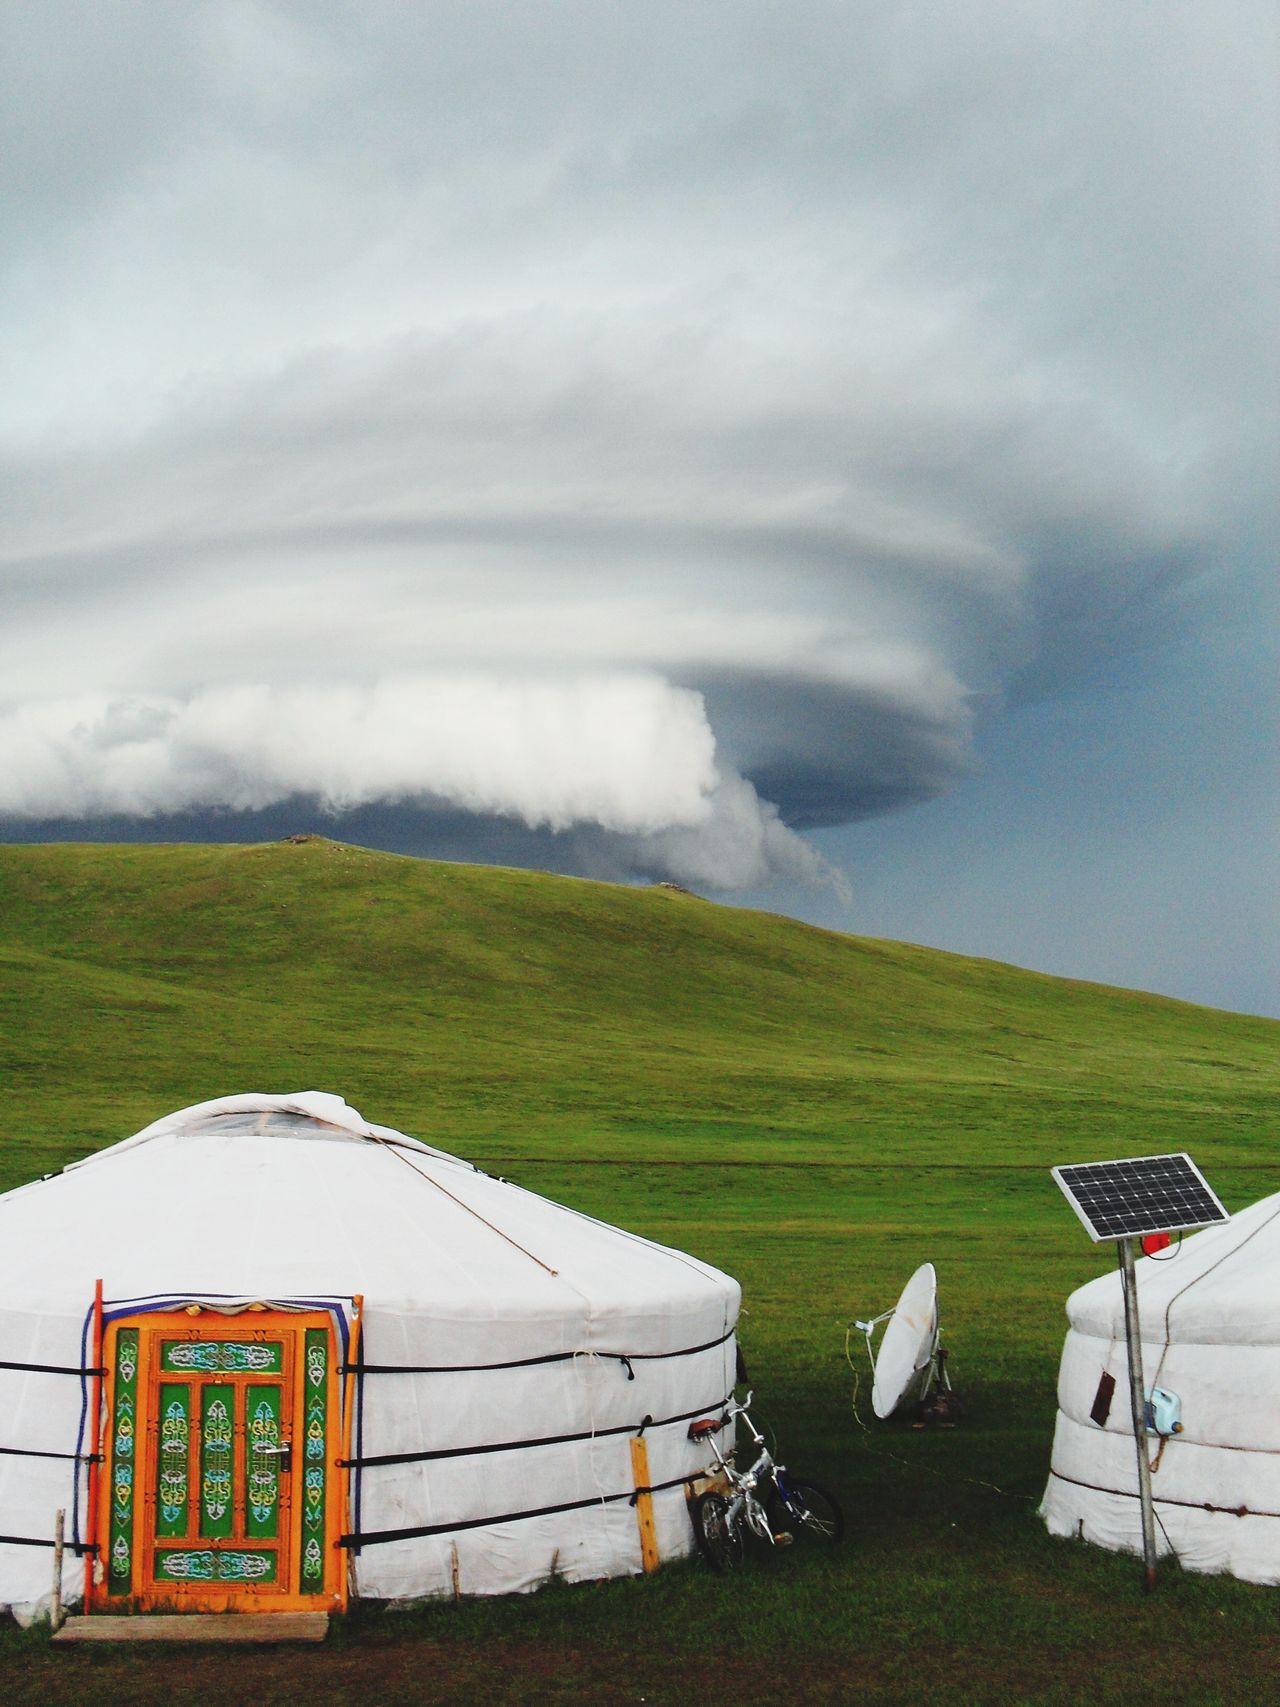 Beautiful stock photos of tornado, cloud - sky, sky, field, nature